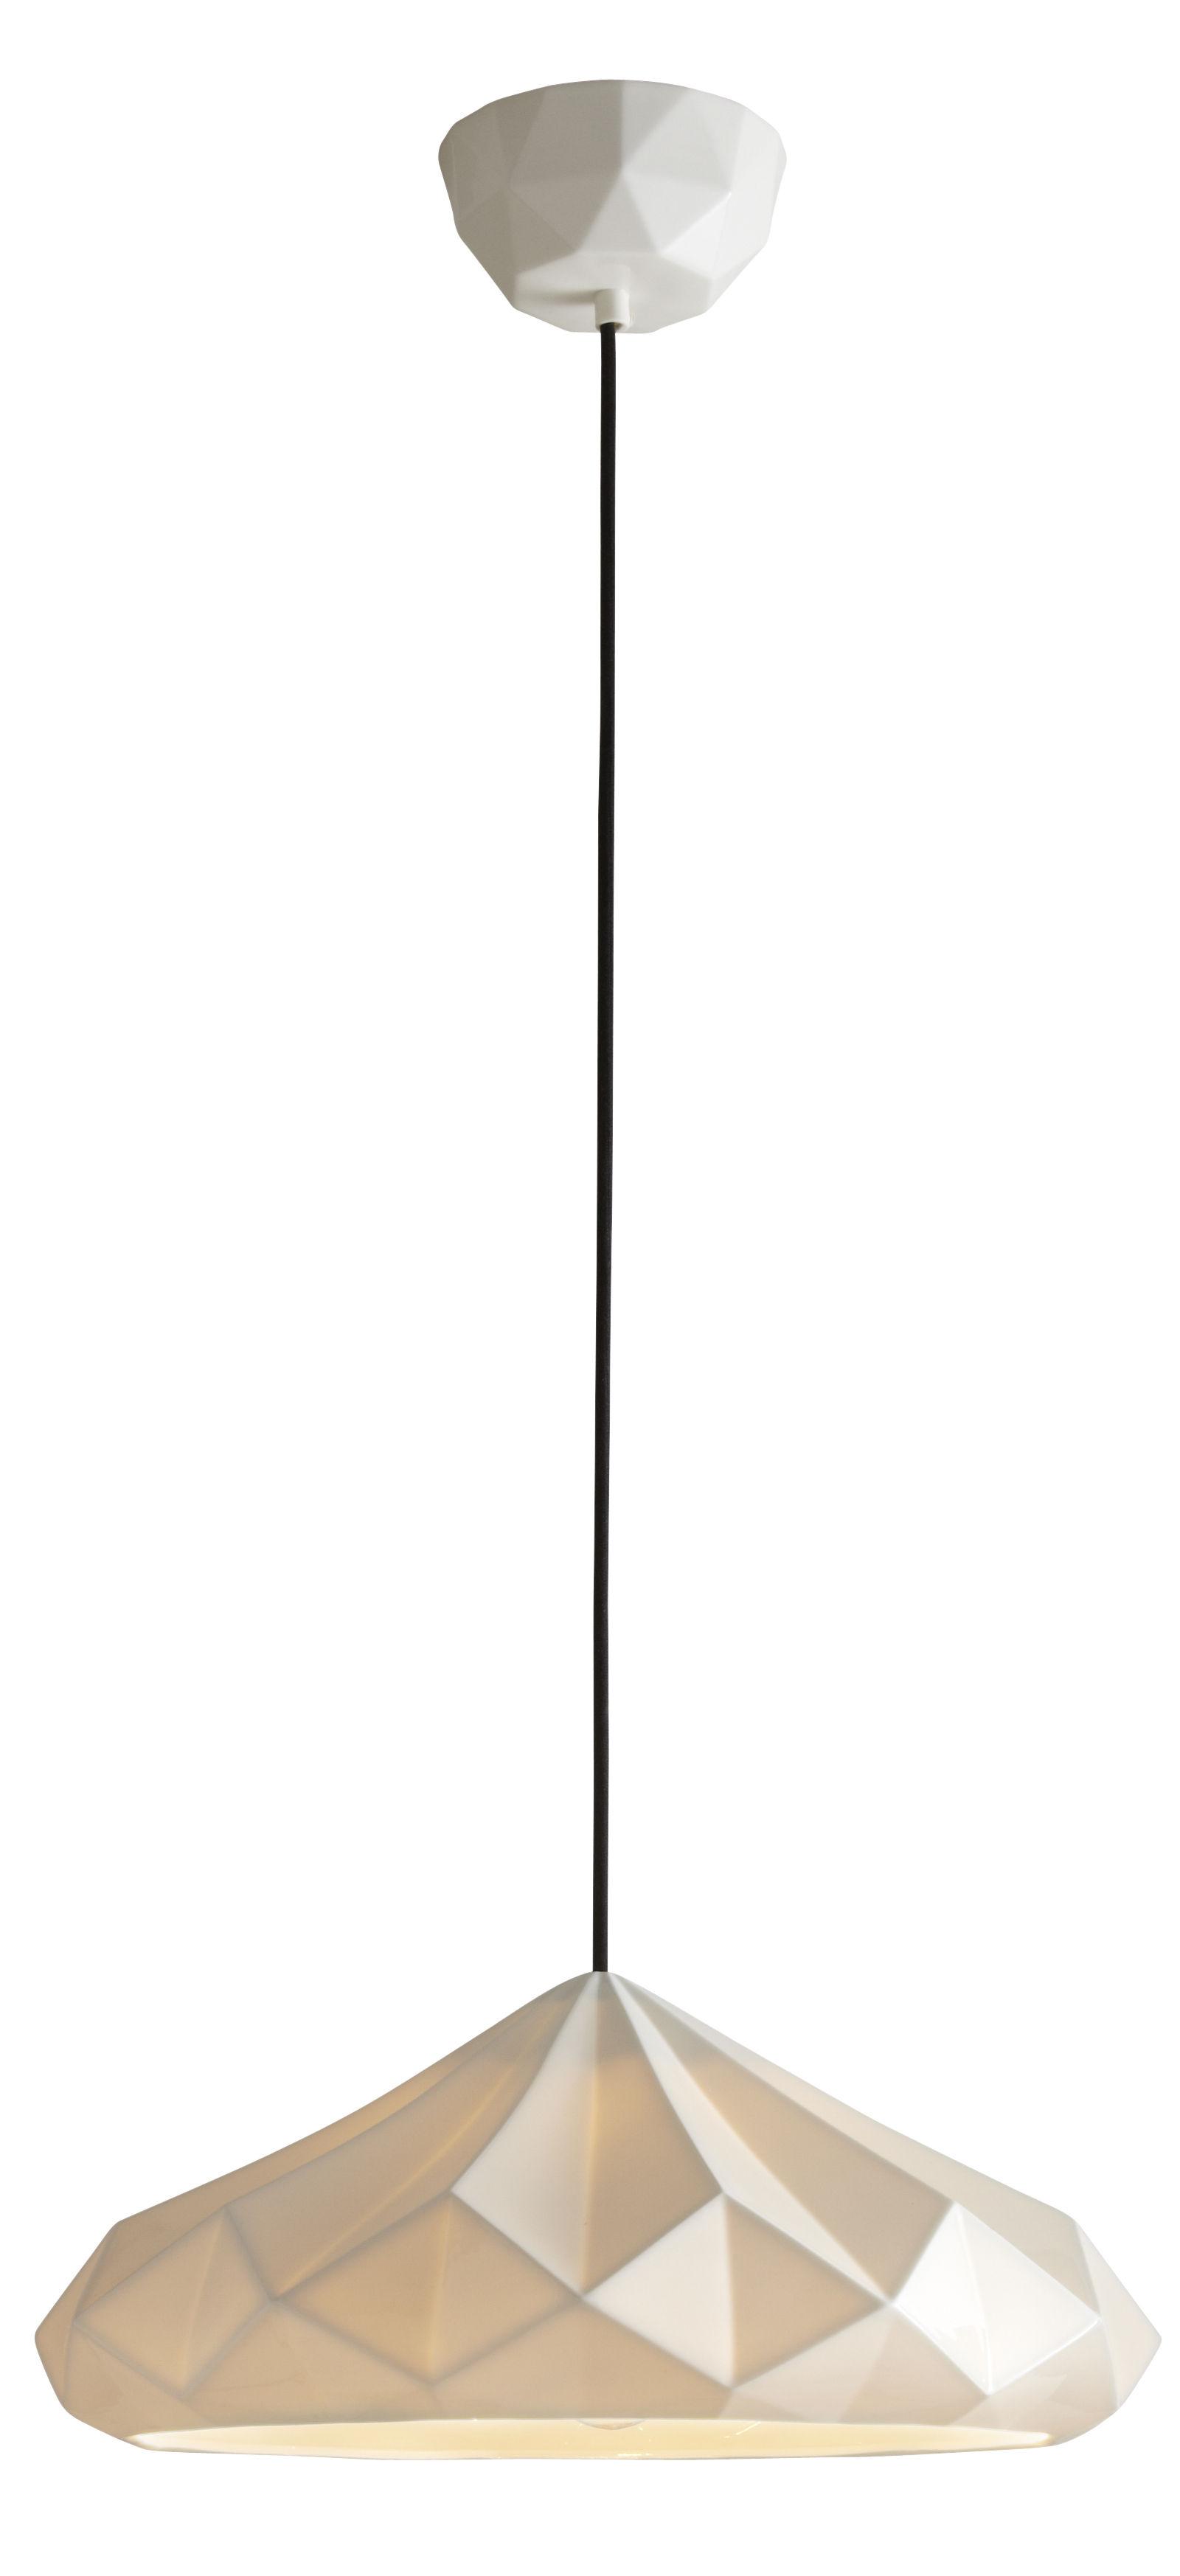 Lighting - Pendant Lighting - Hatton 4 Pendant - Ø 41,5 x H 18 cm - Bone China by Original BTC - White - China